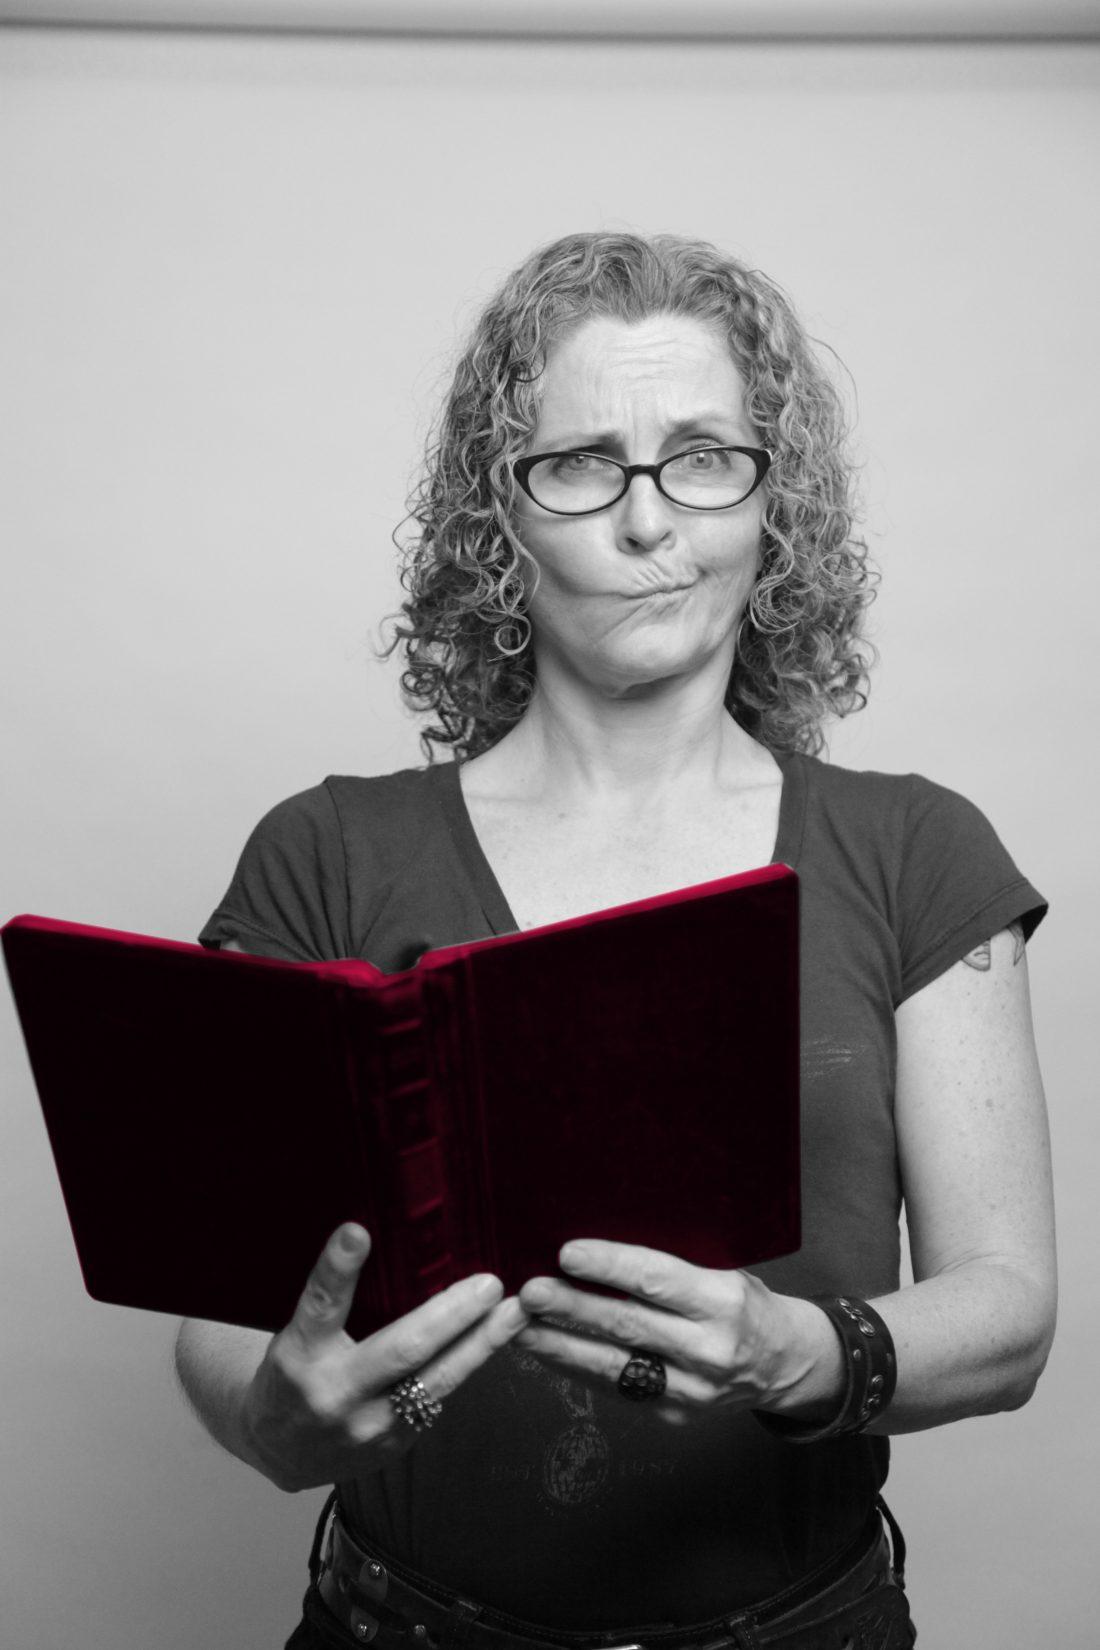 Christine McGlade, Q Media, Interactive